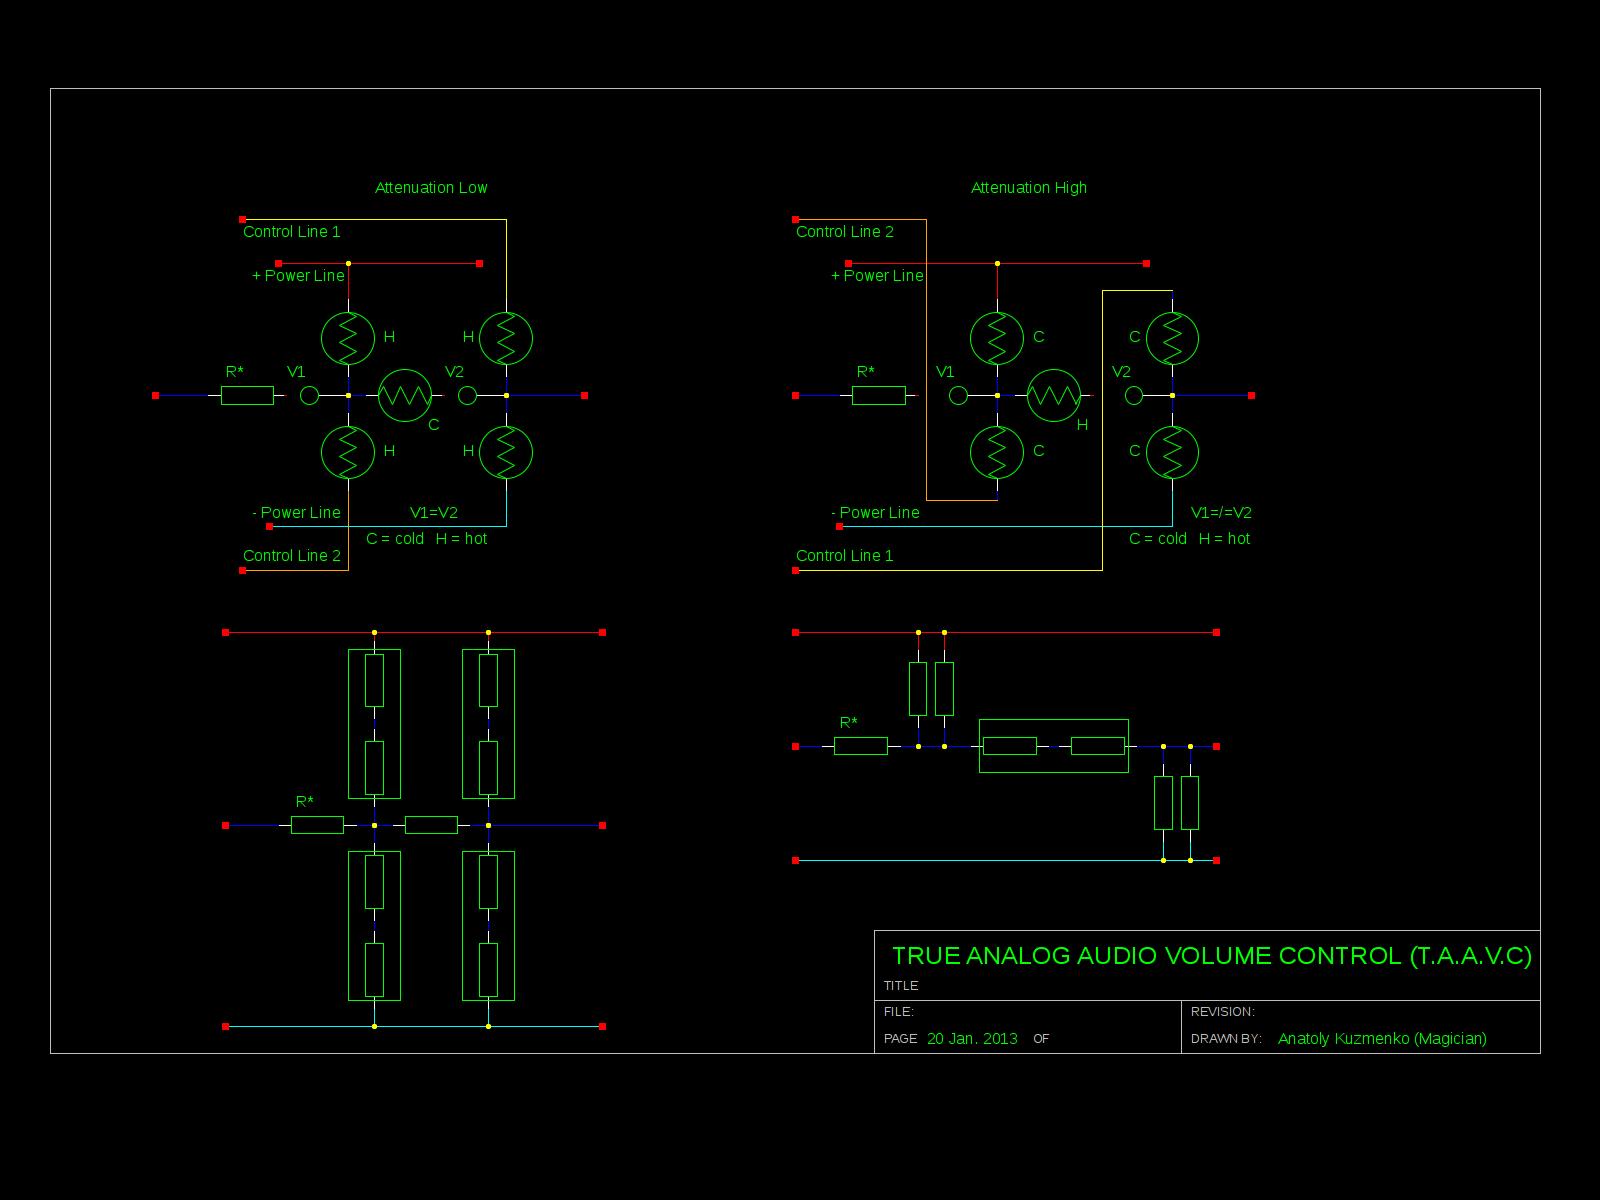 True Analog Audio Volume Control using Arduino Schematic